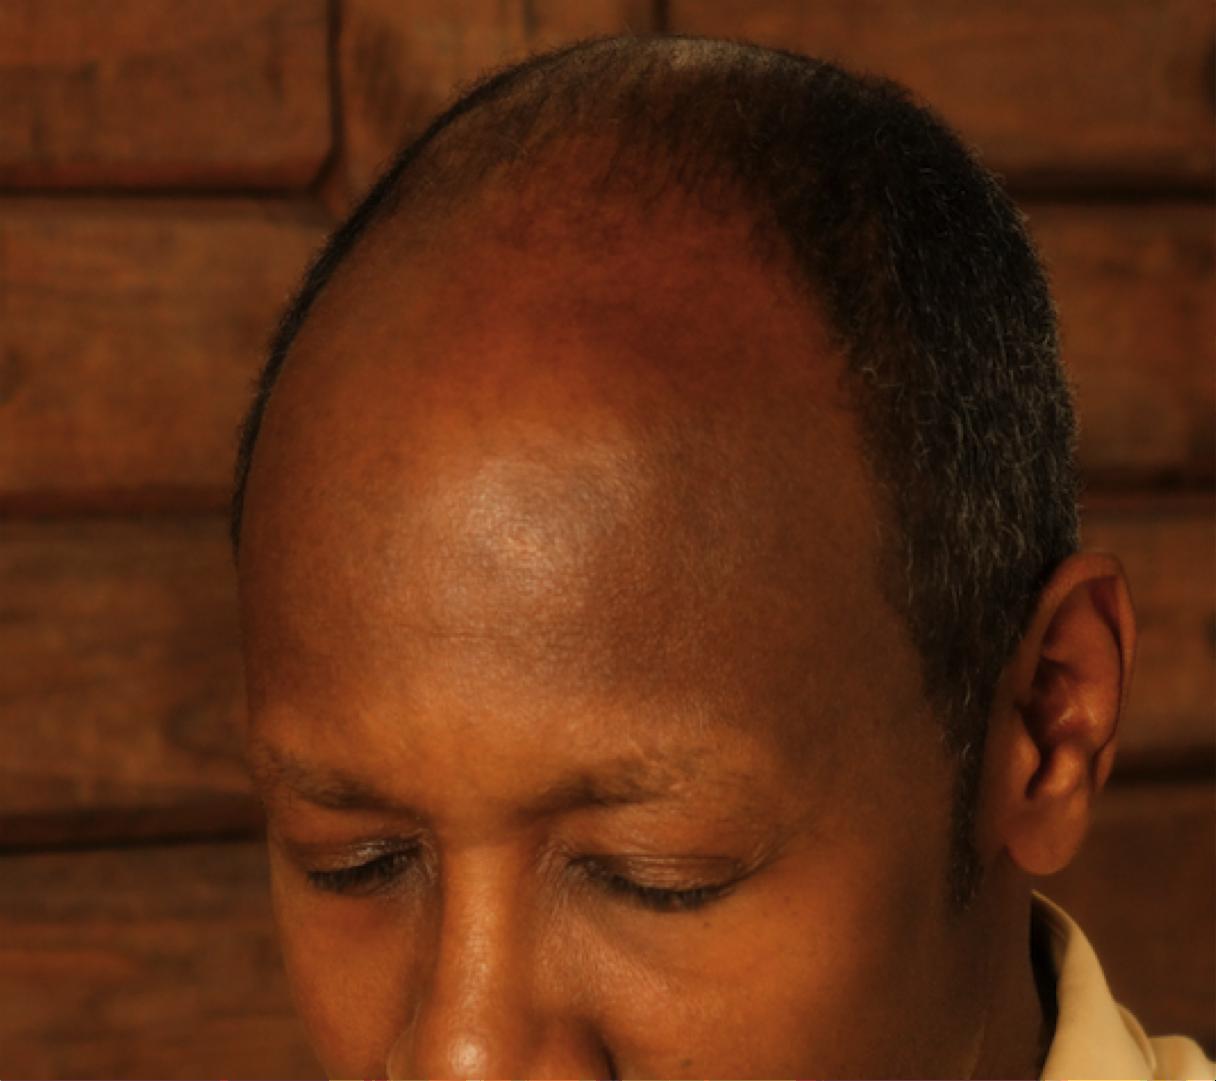 bald black man.png